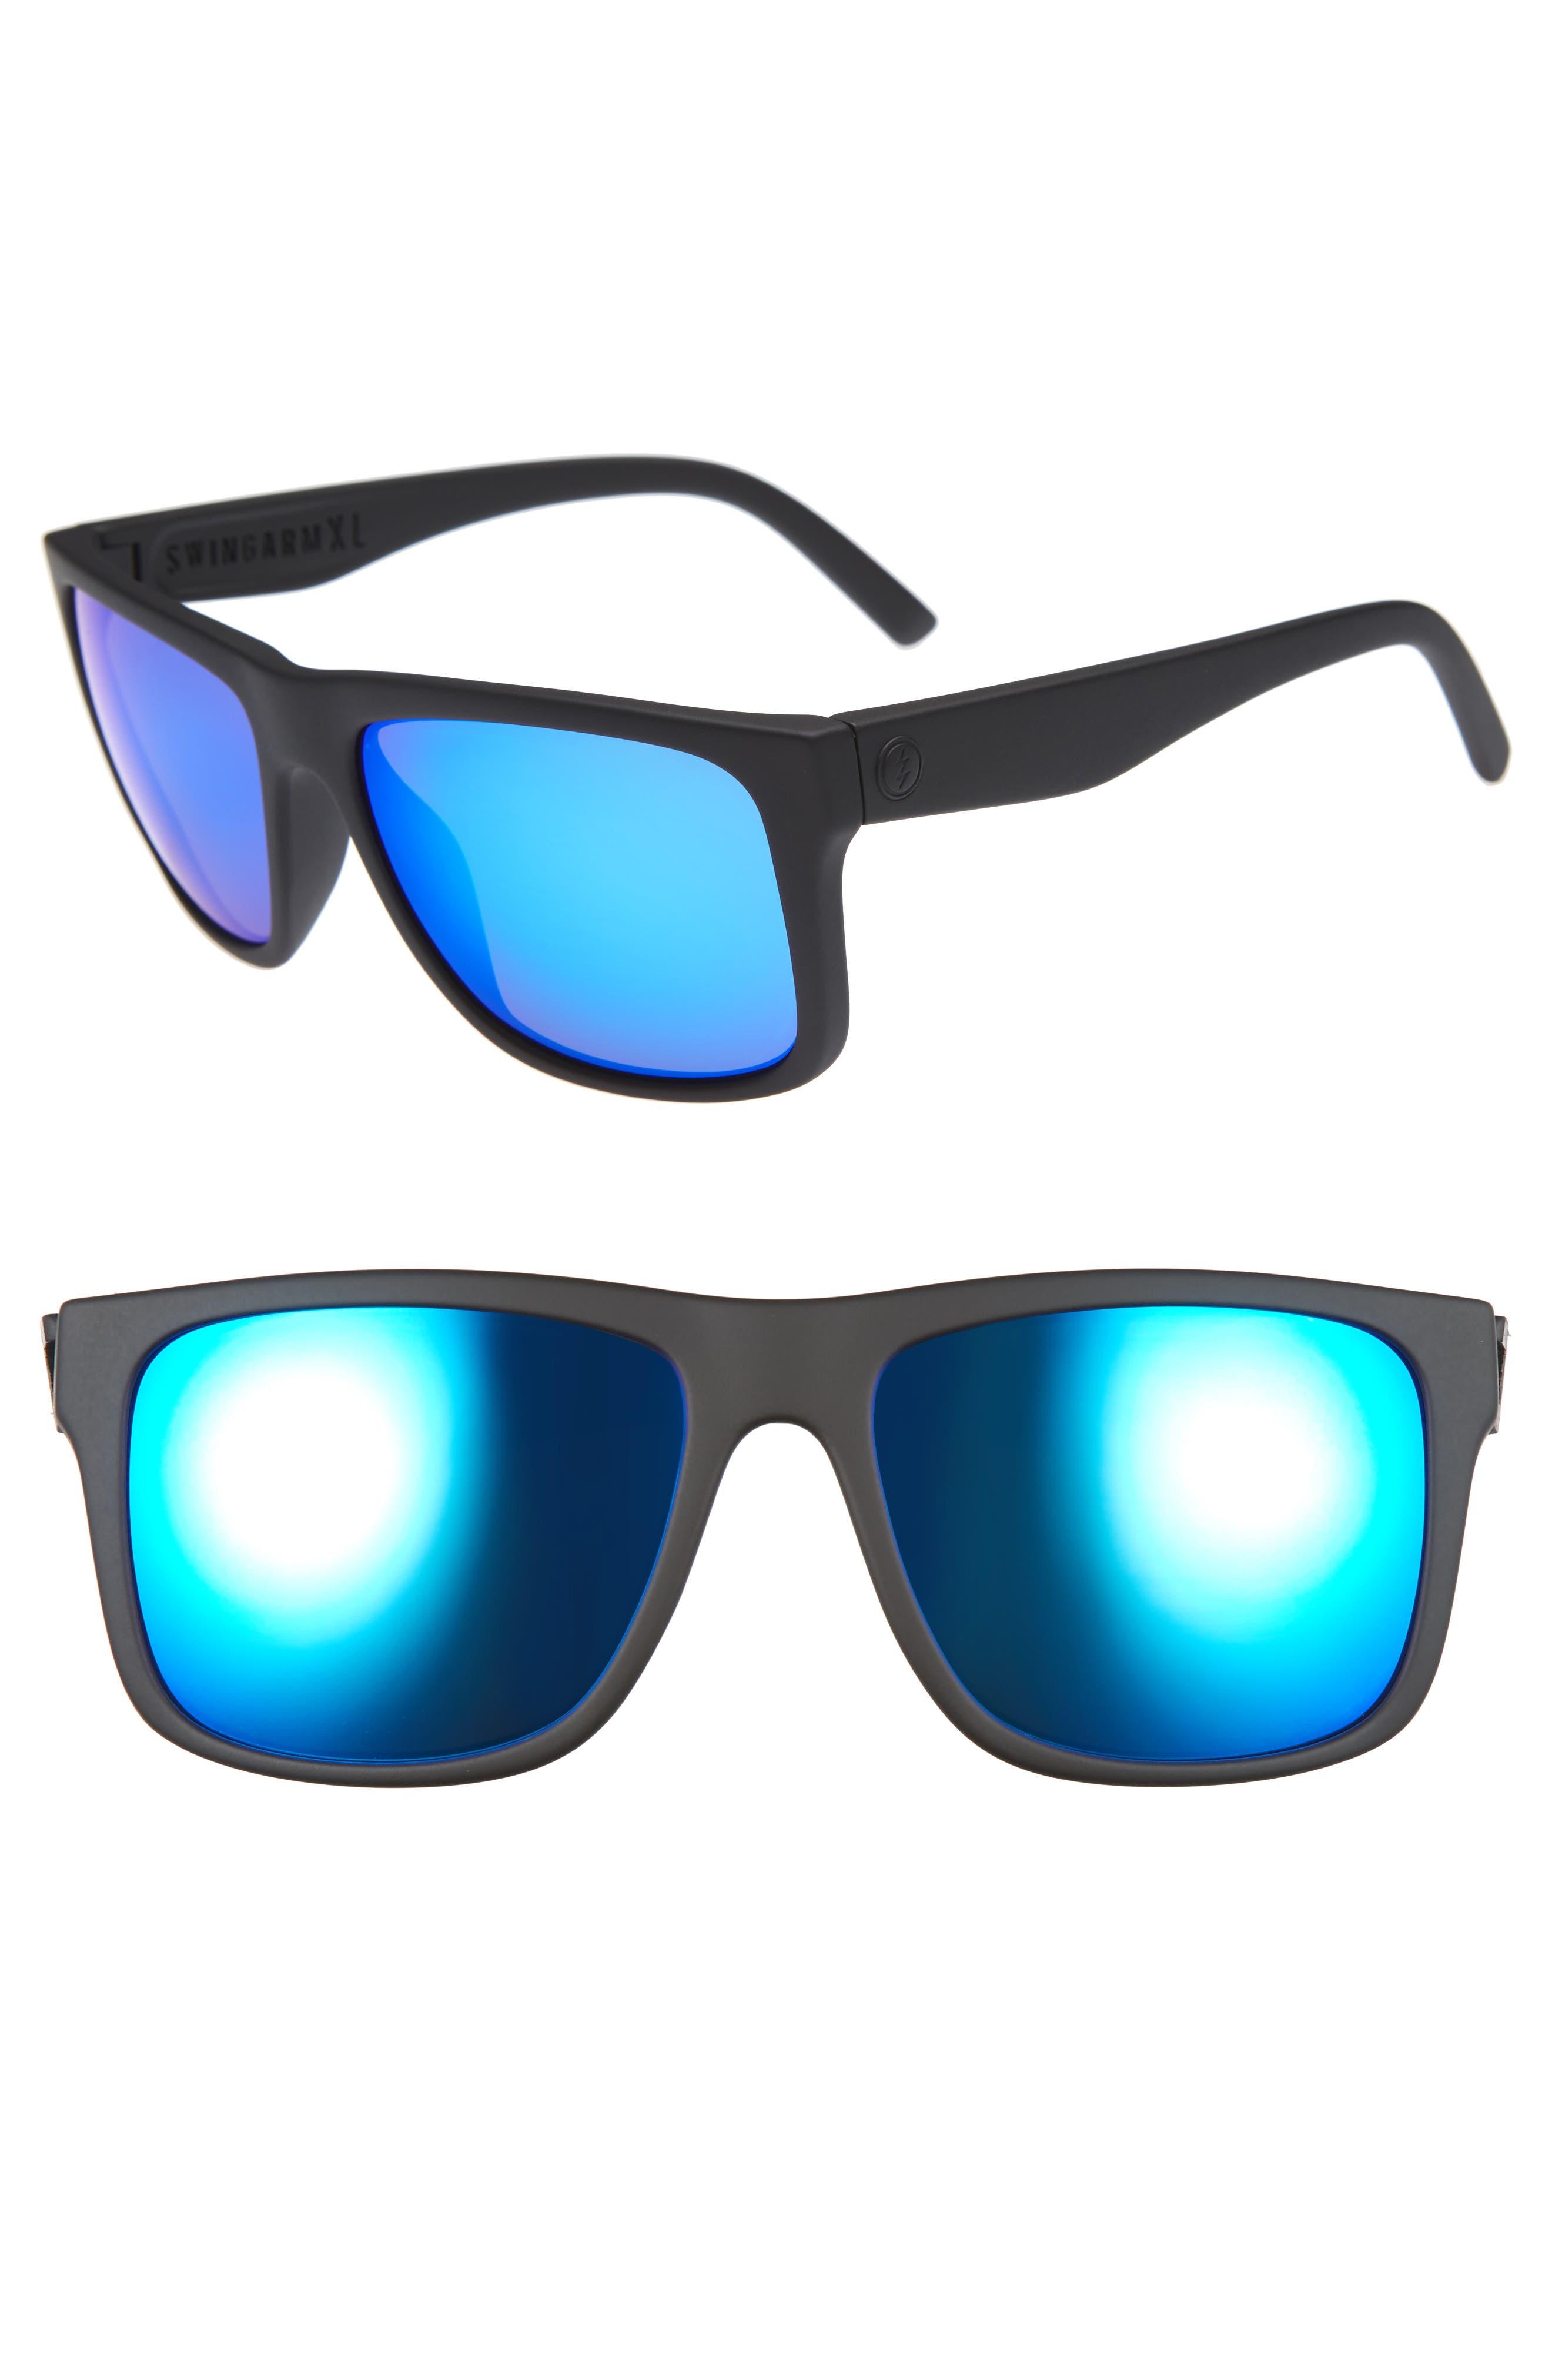 Swingarm XL 59mm Sunglasses,                         Main,                         color, 001